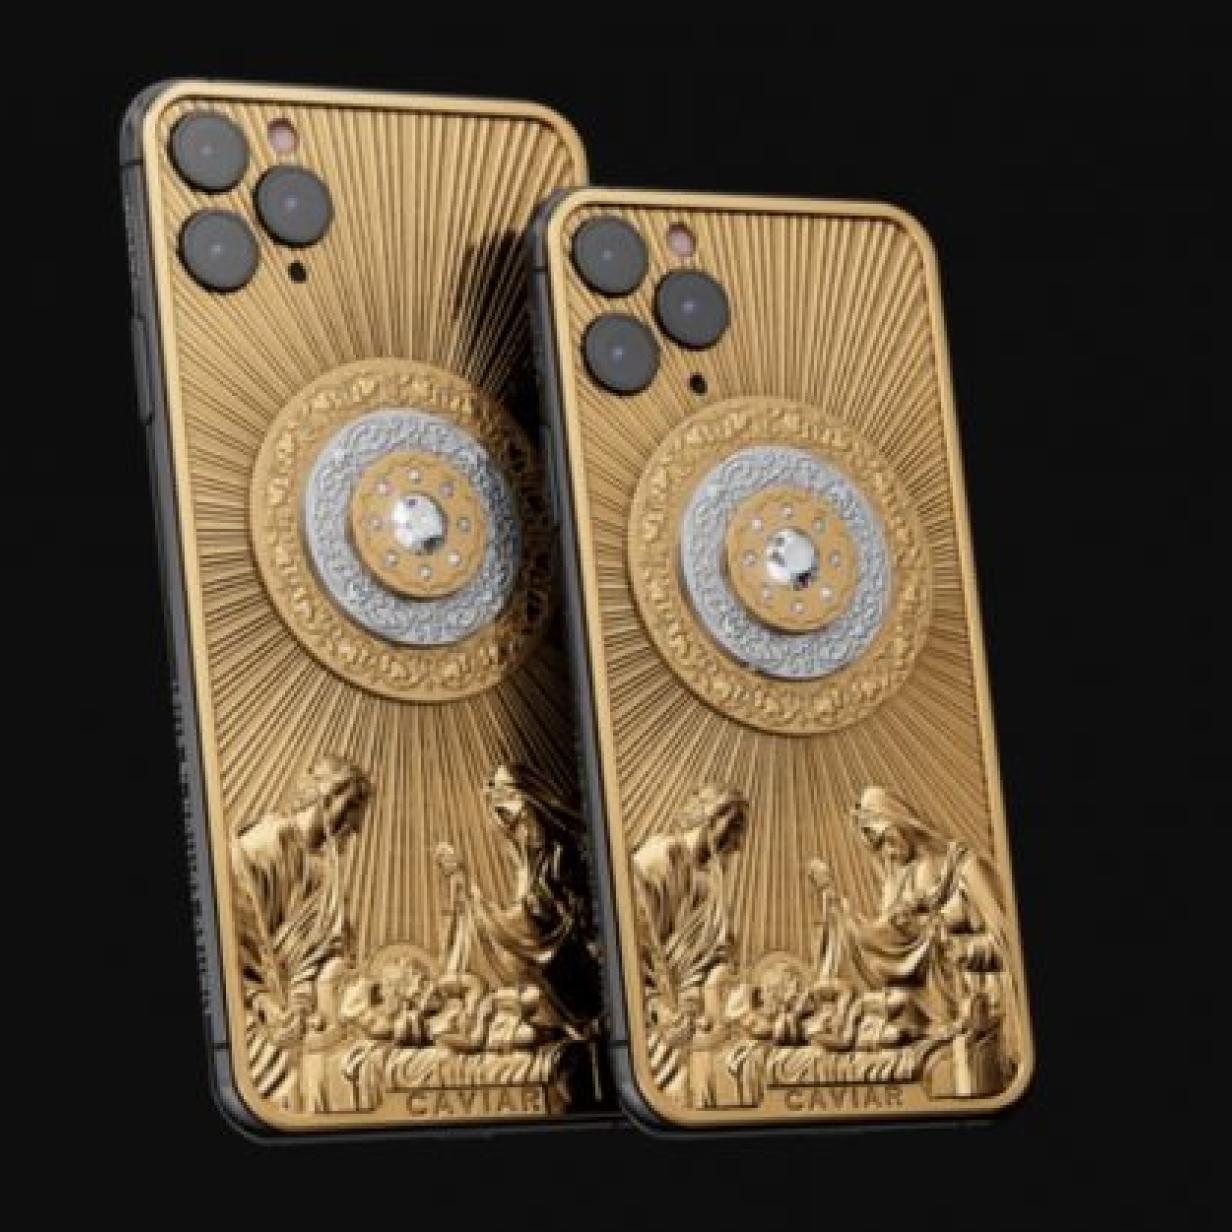 Dekadentes goldenes Jesus-iPhone für 115.000 Euro